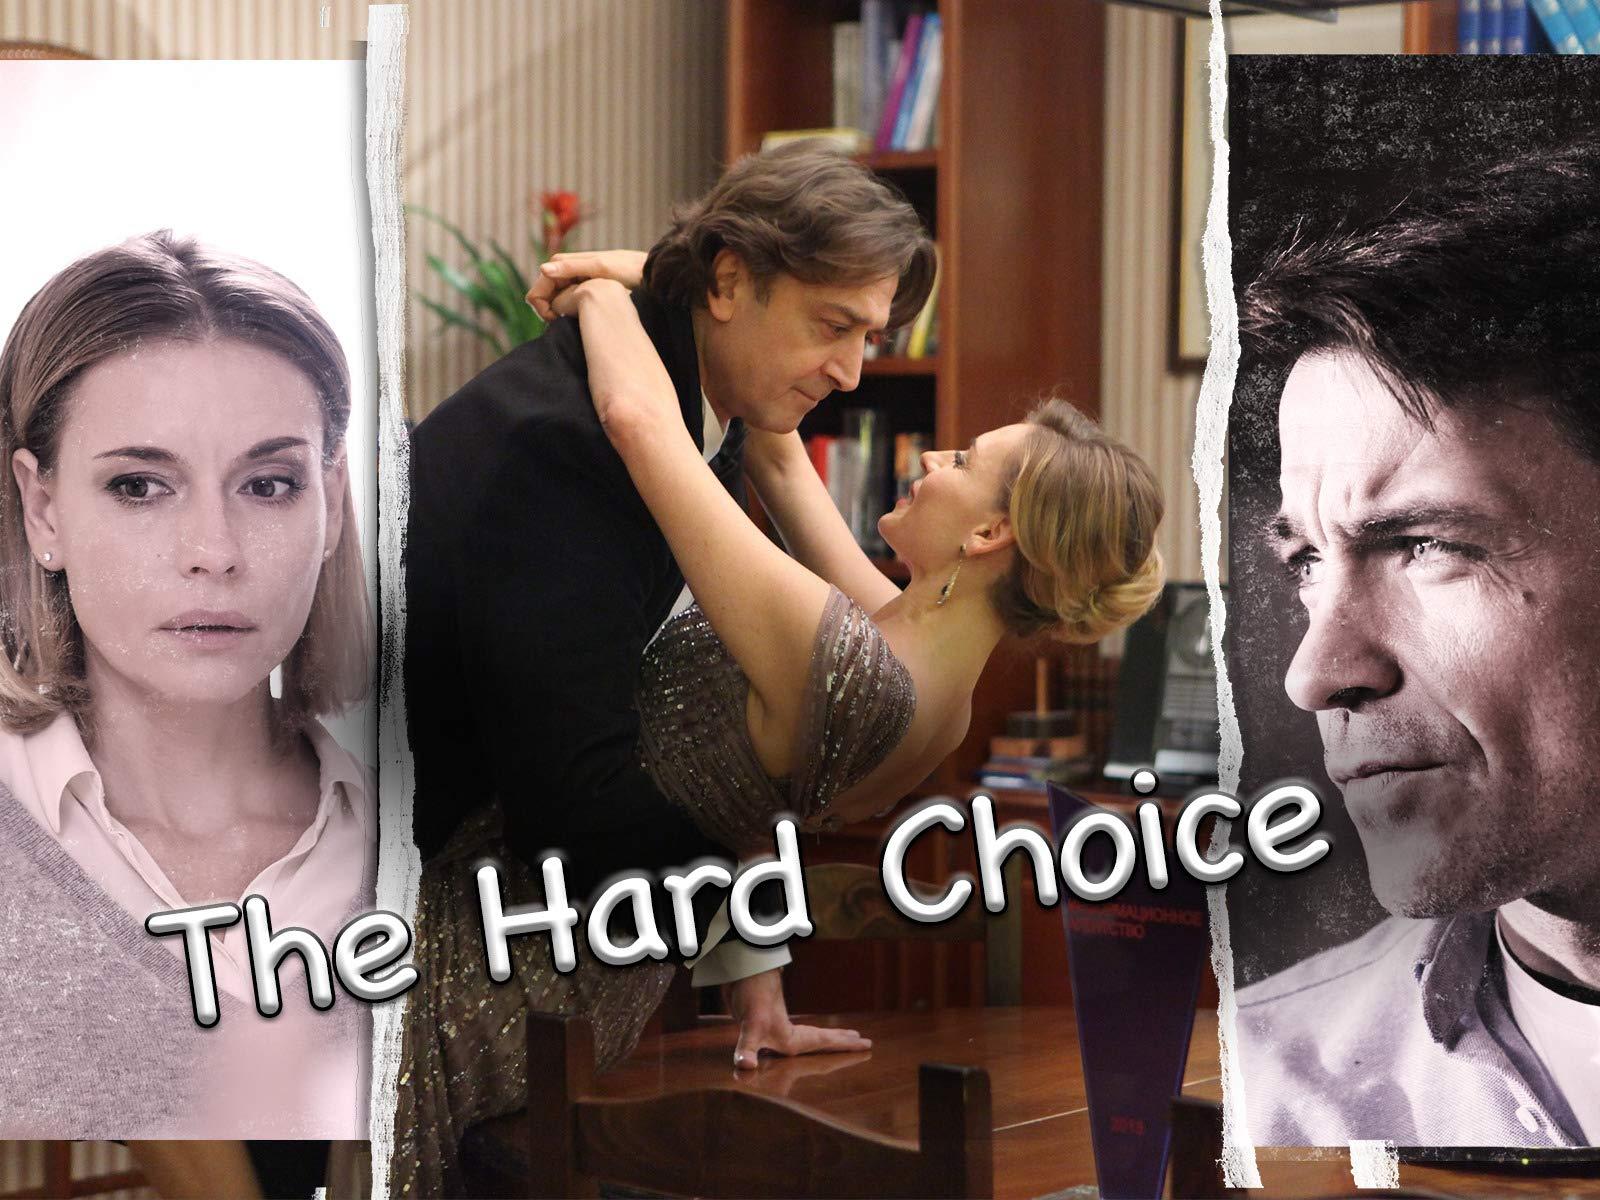 The Hard Choice